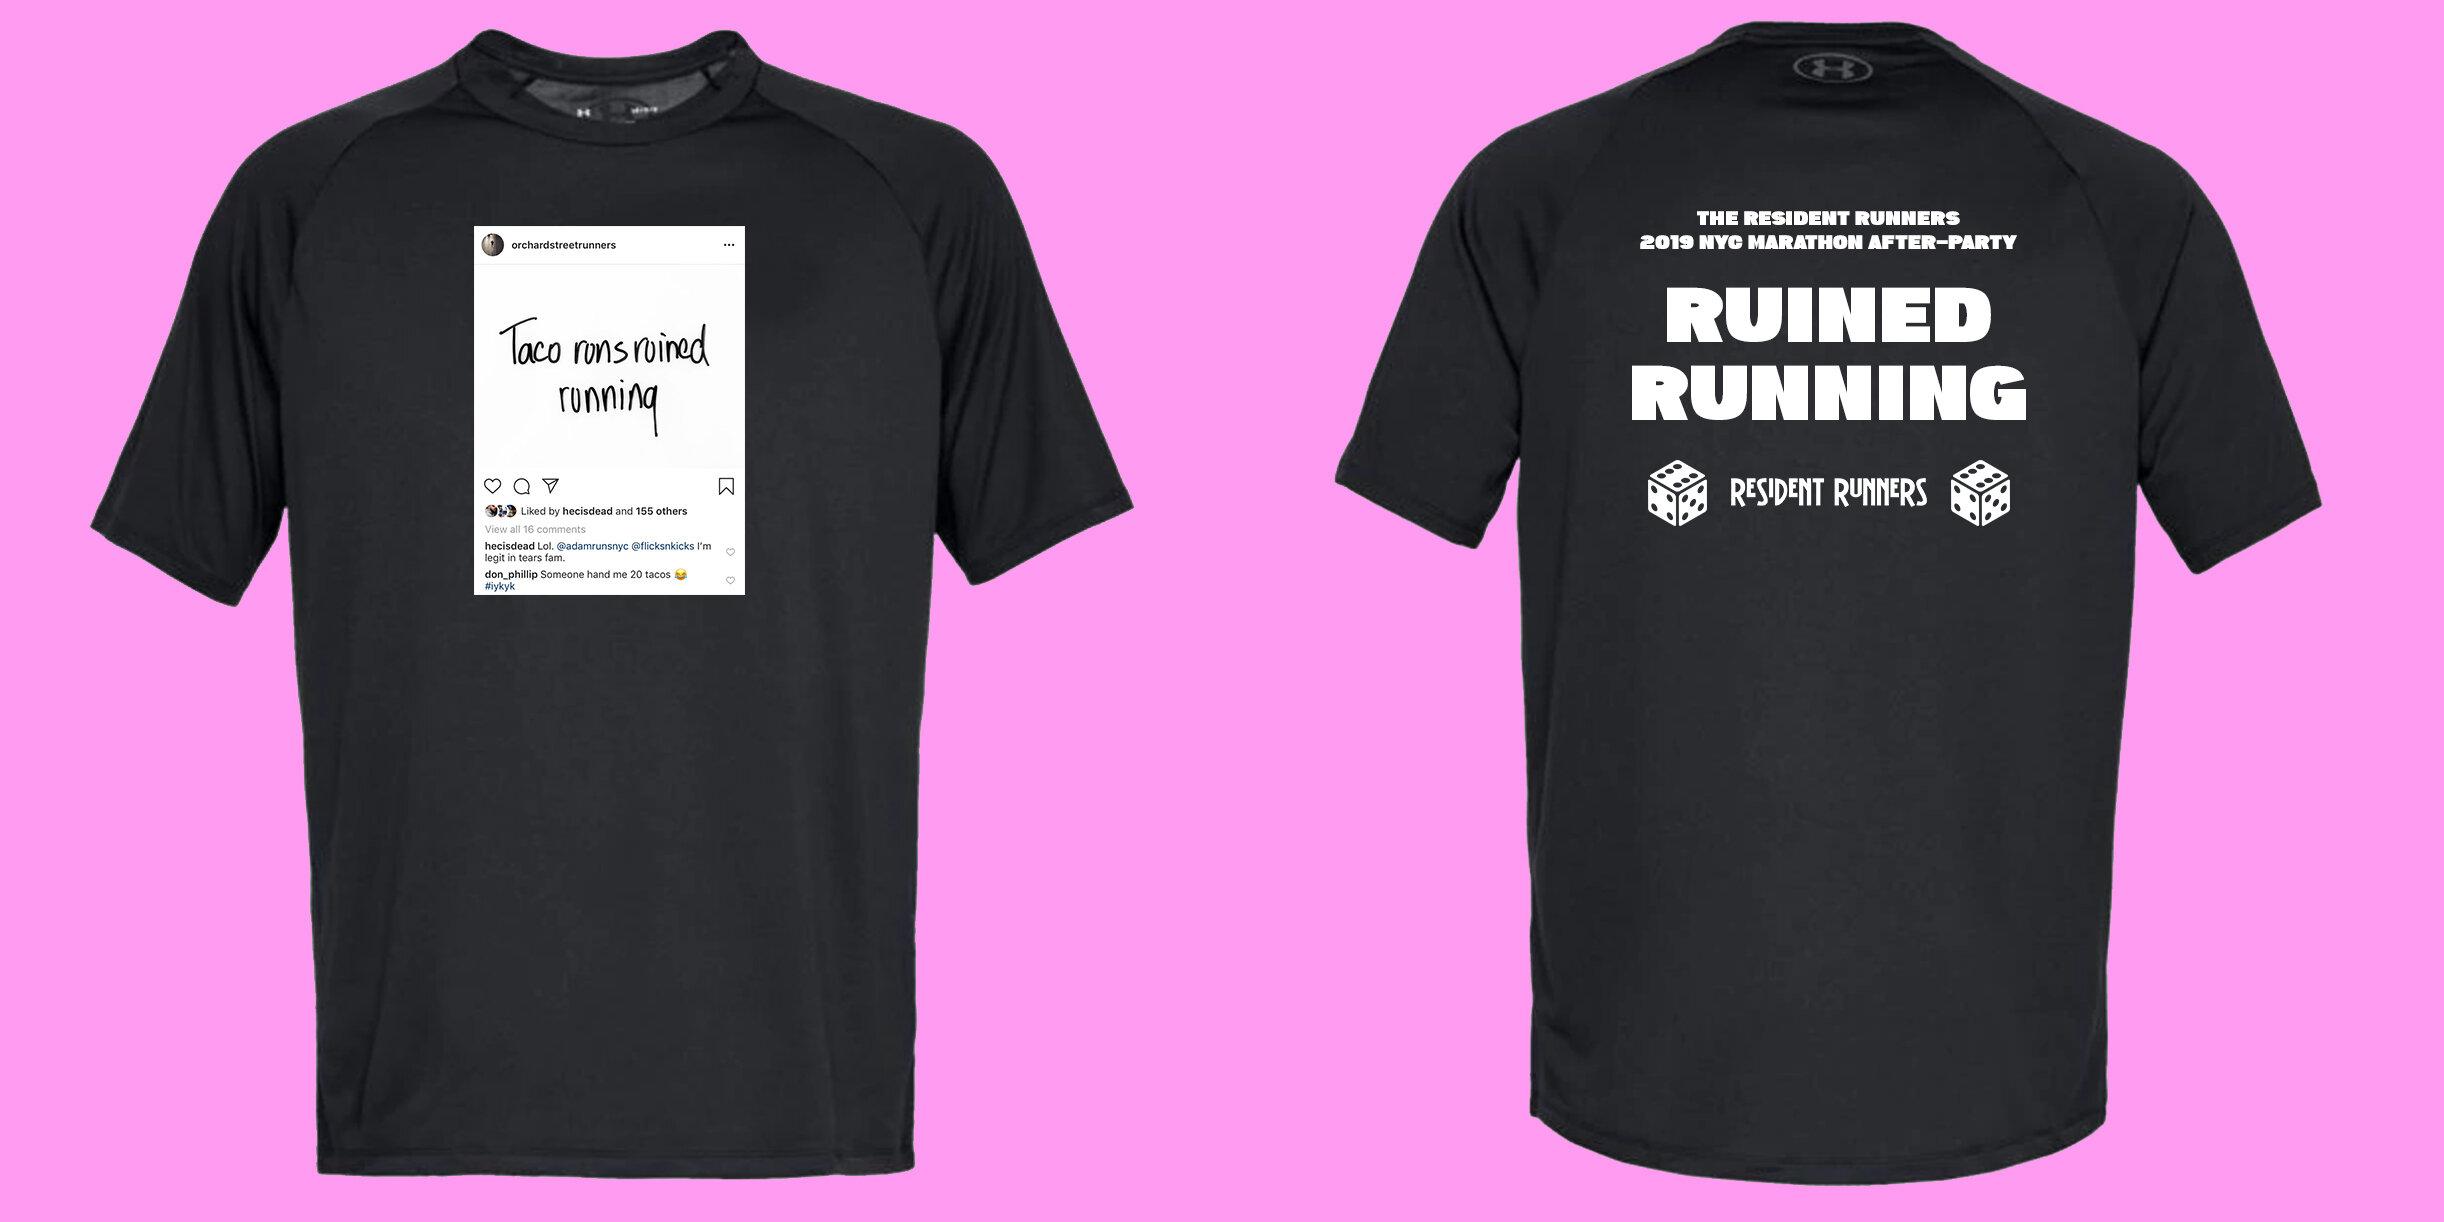 2019_nyc_marathon_after-party_tshirt_v1-p.jpg